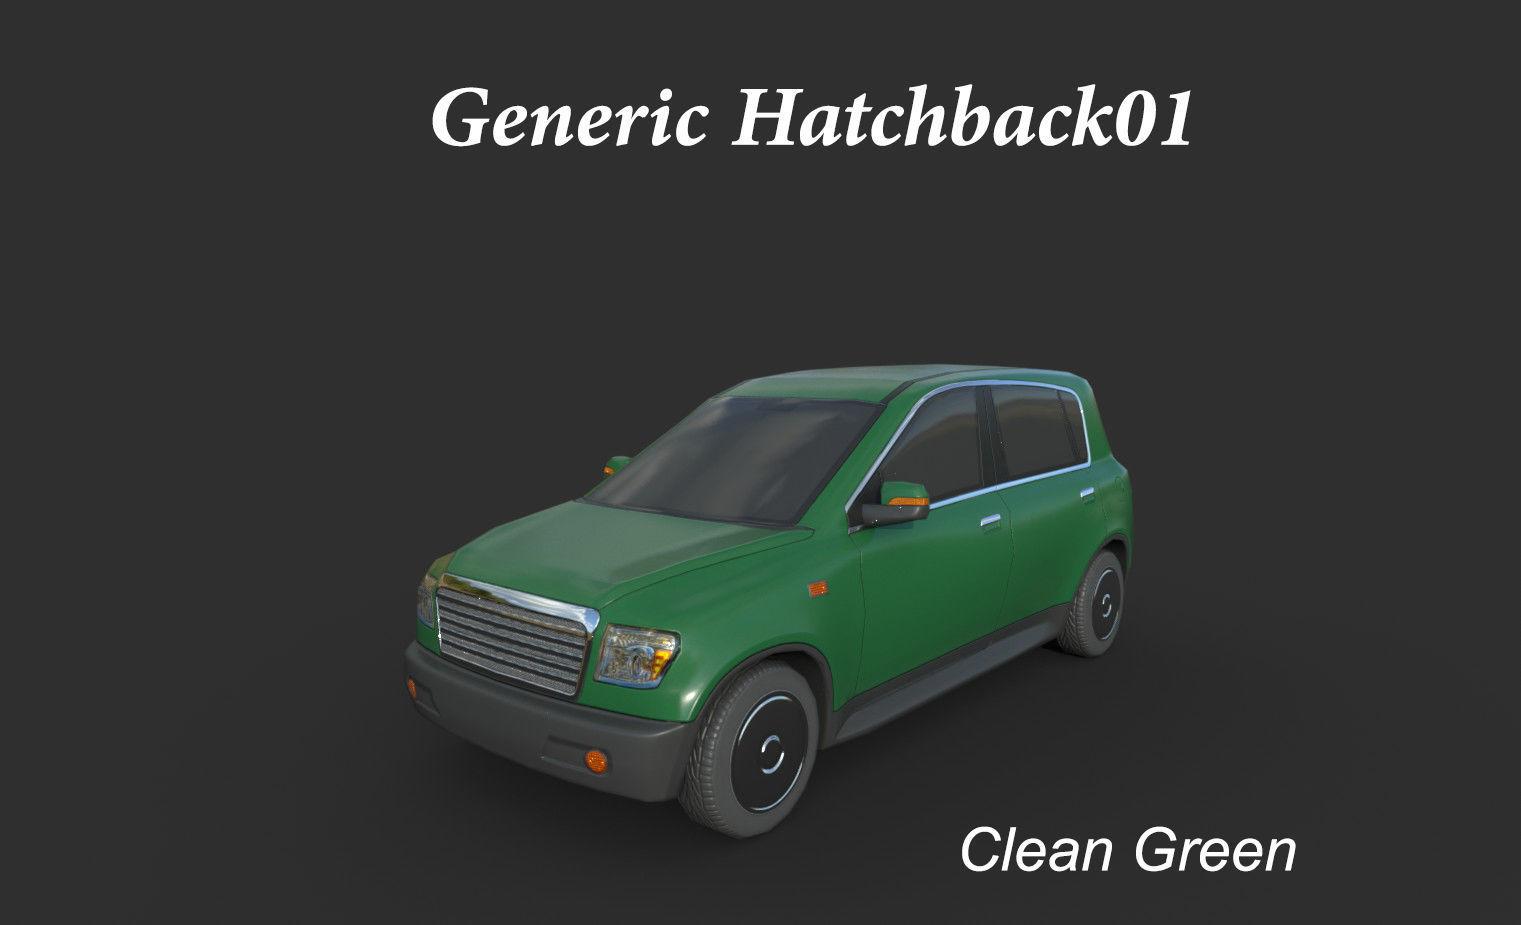 Generic Hatchback 01 Clean Green